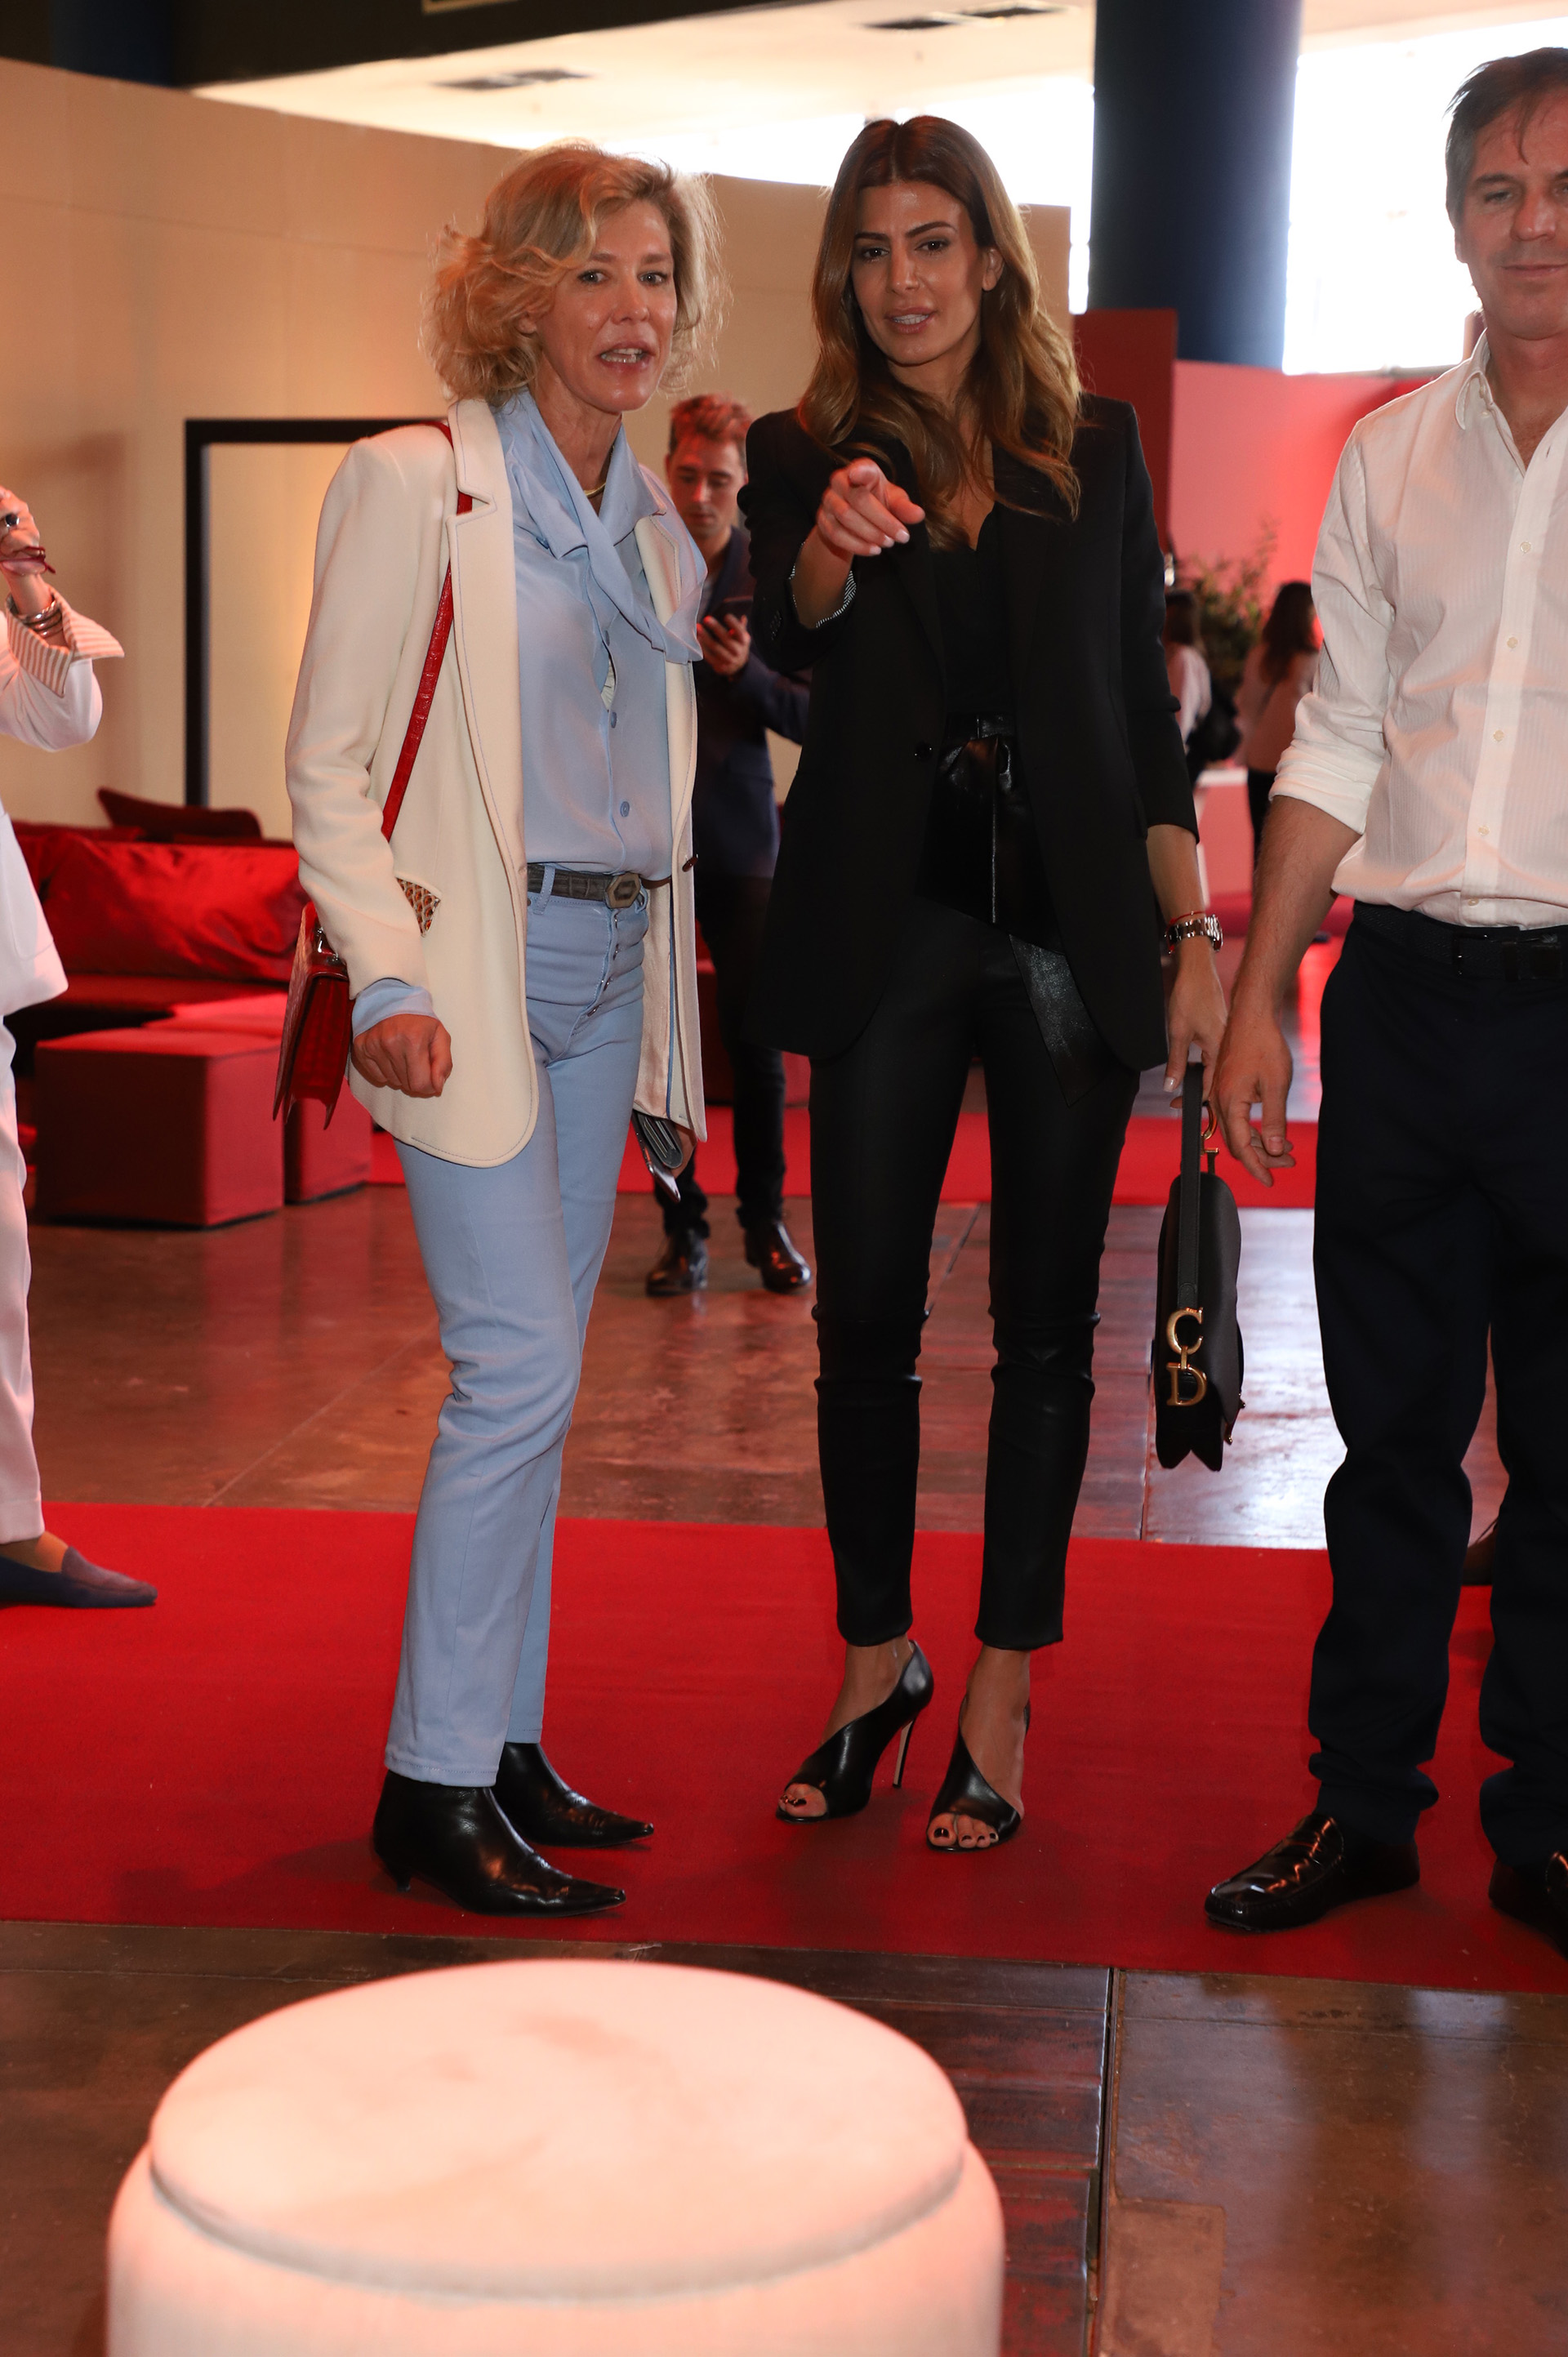 Alexandra de Royere, CEO de Solantu, y Juliana Awada